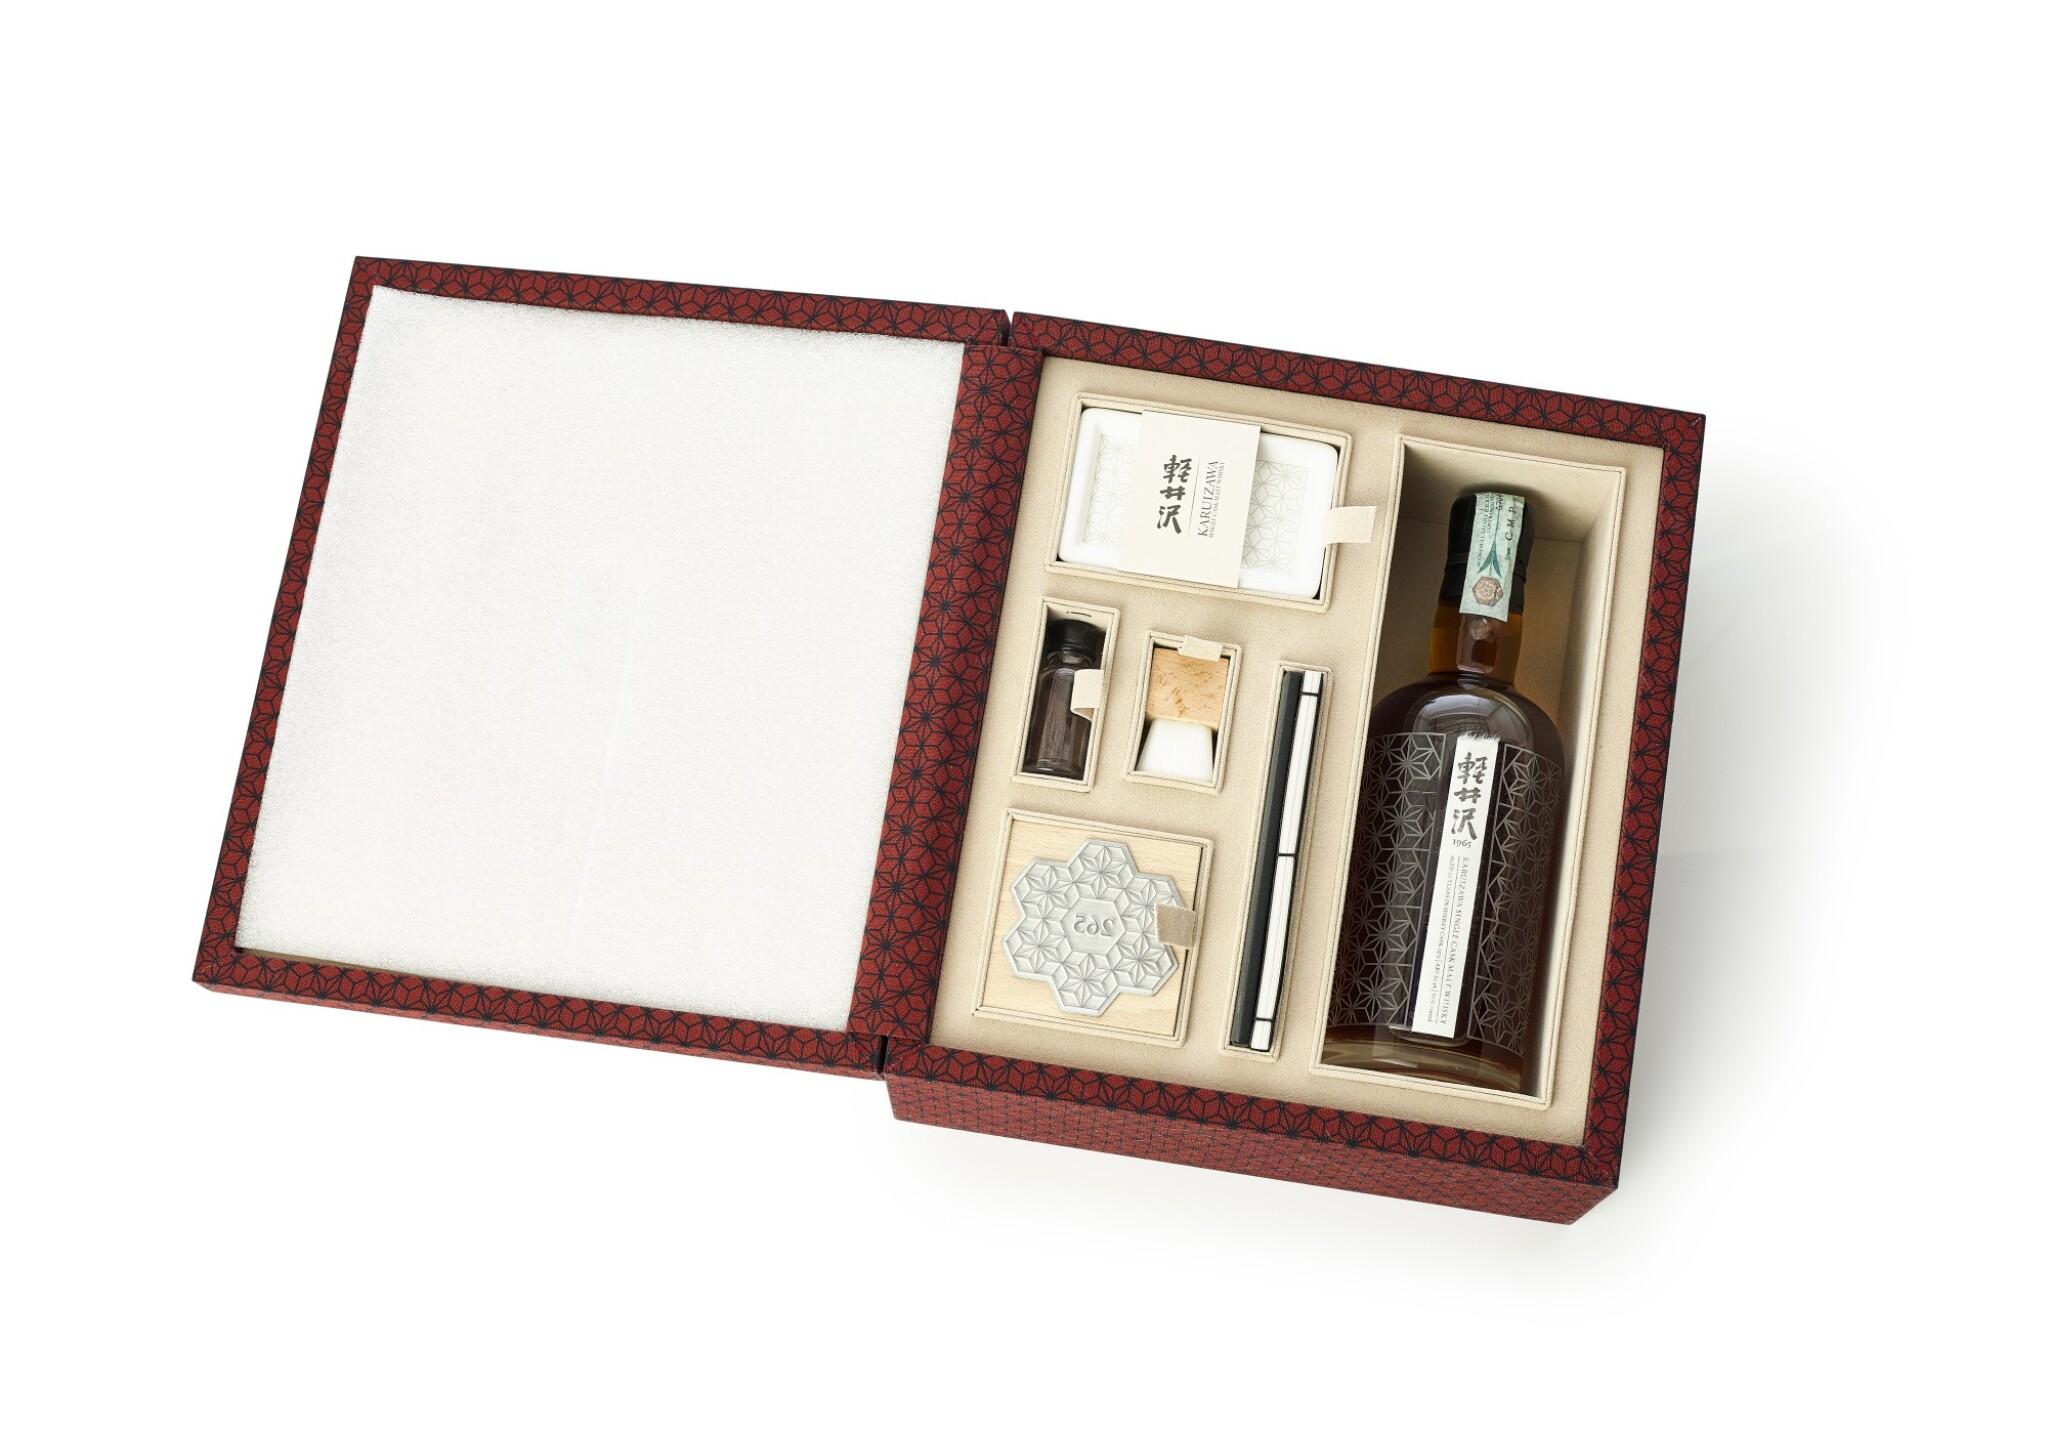 View full screen - View 1 of Lot 7660. 輕井澤Karuizawa Single Malt Whisky Aged 50 Years - Sherry Cask #2372 1965 (1 BT70).